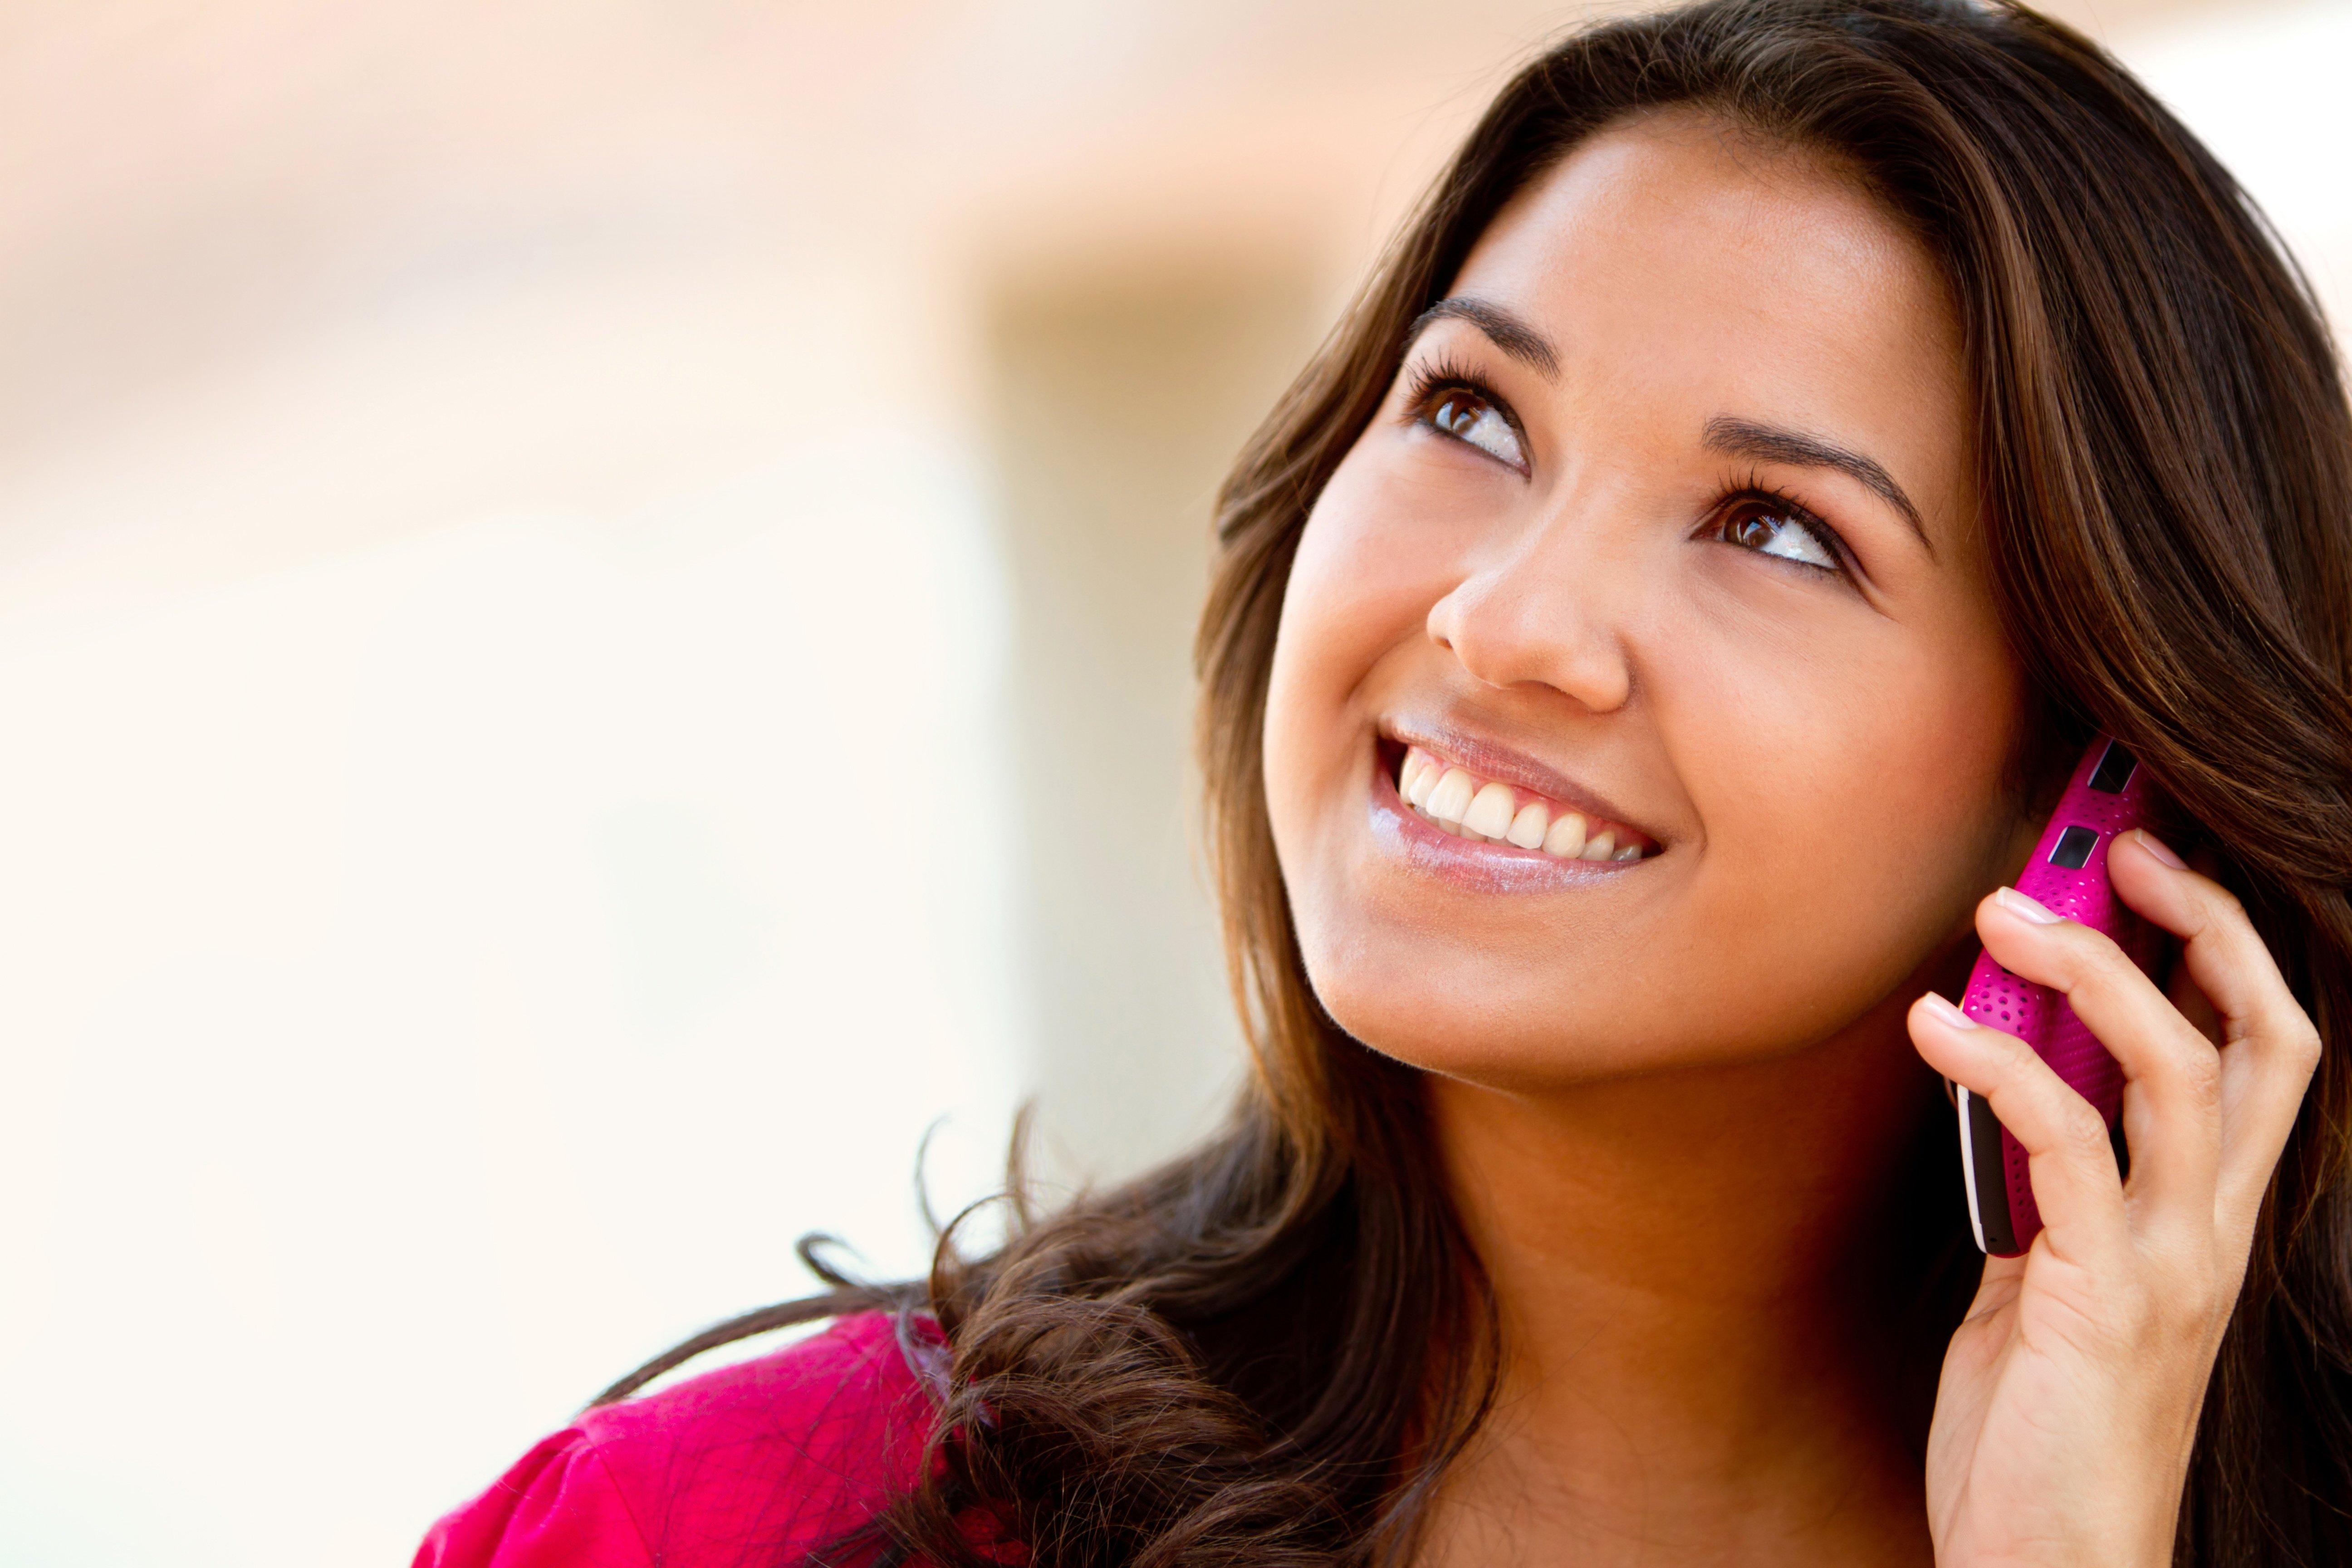 girl smile w pink phone.jpg